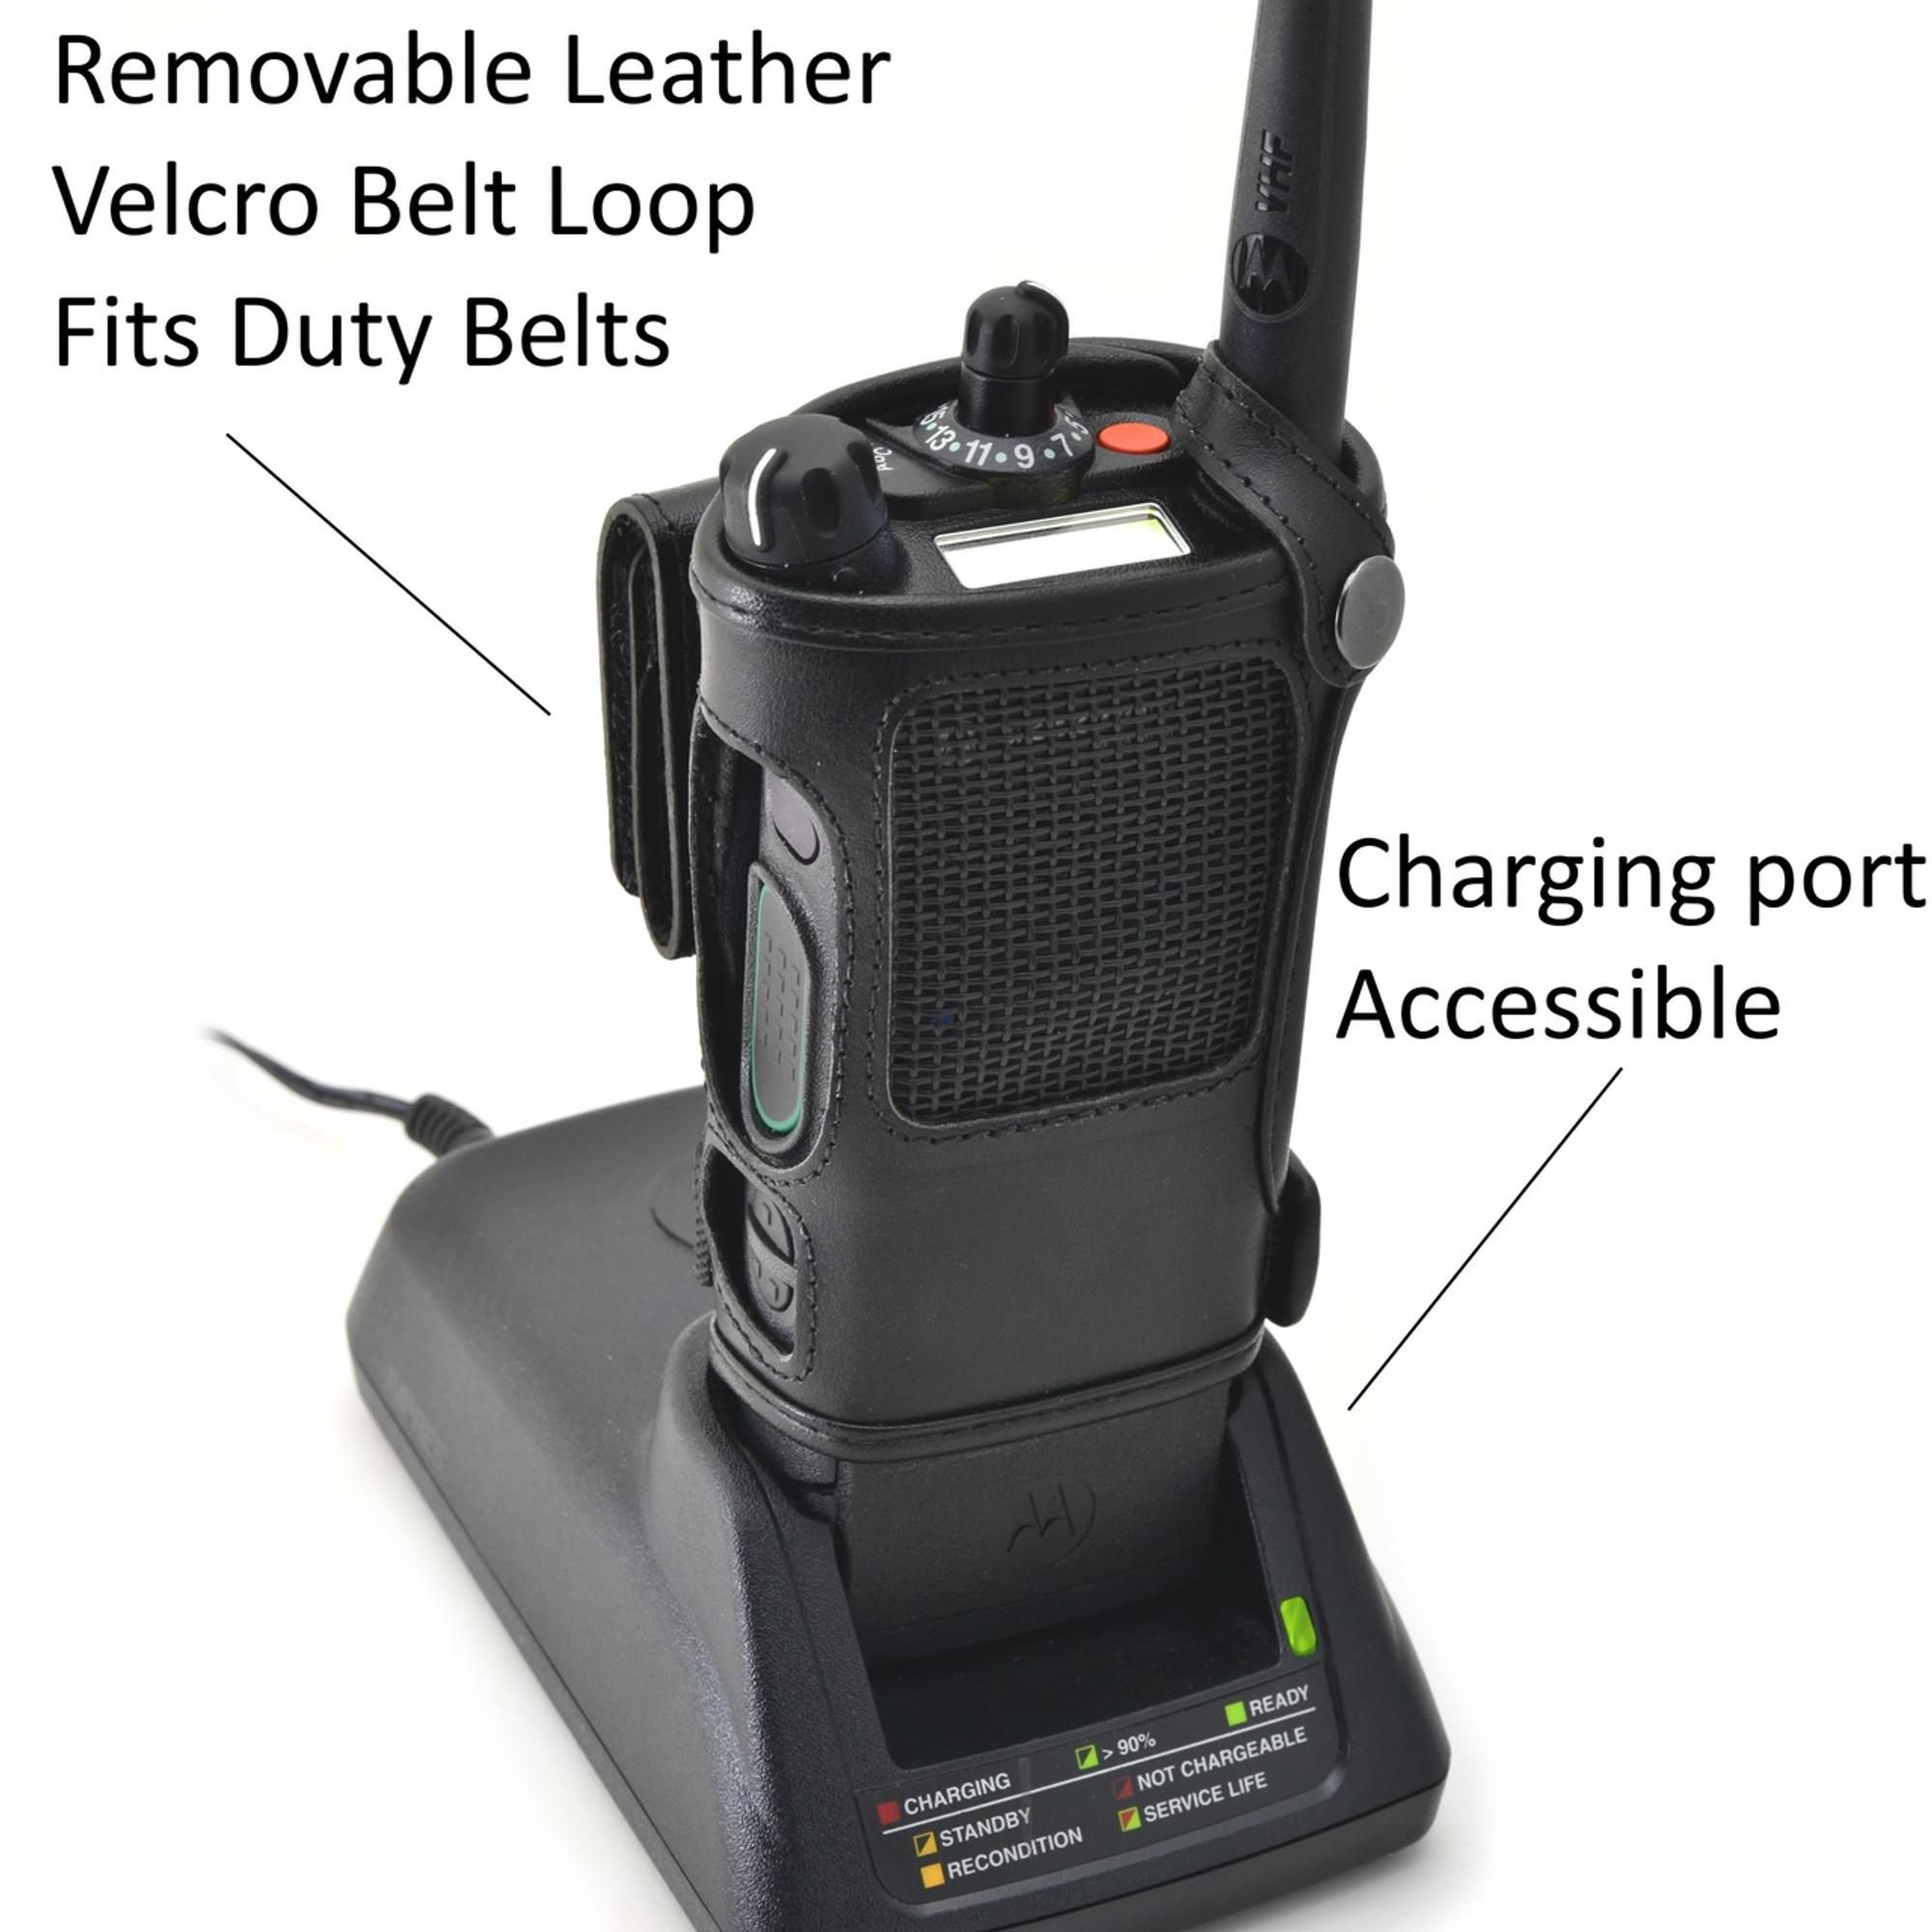 Radio holder motorola apx 6000 - Motorola Apx 8000 Belt Carry Holder Case By Turtleback Black Leather Duty Belt Holster With